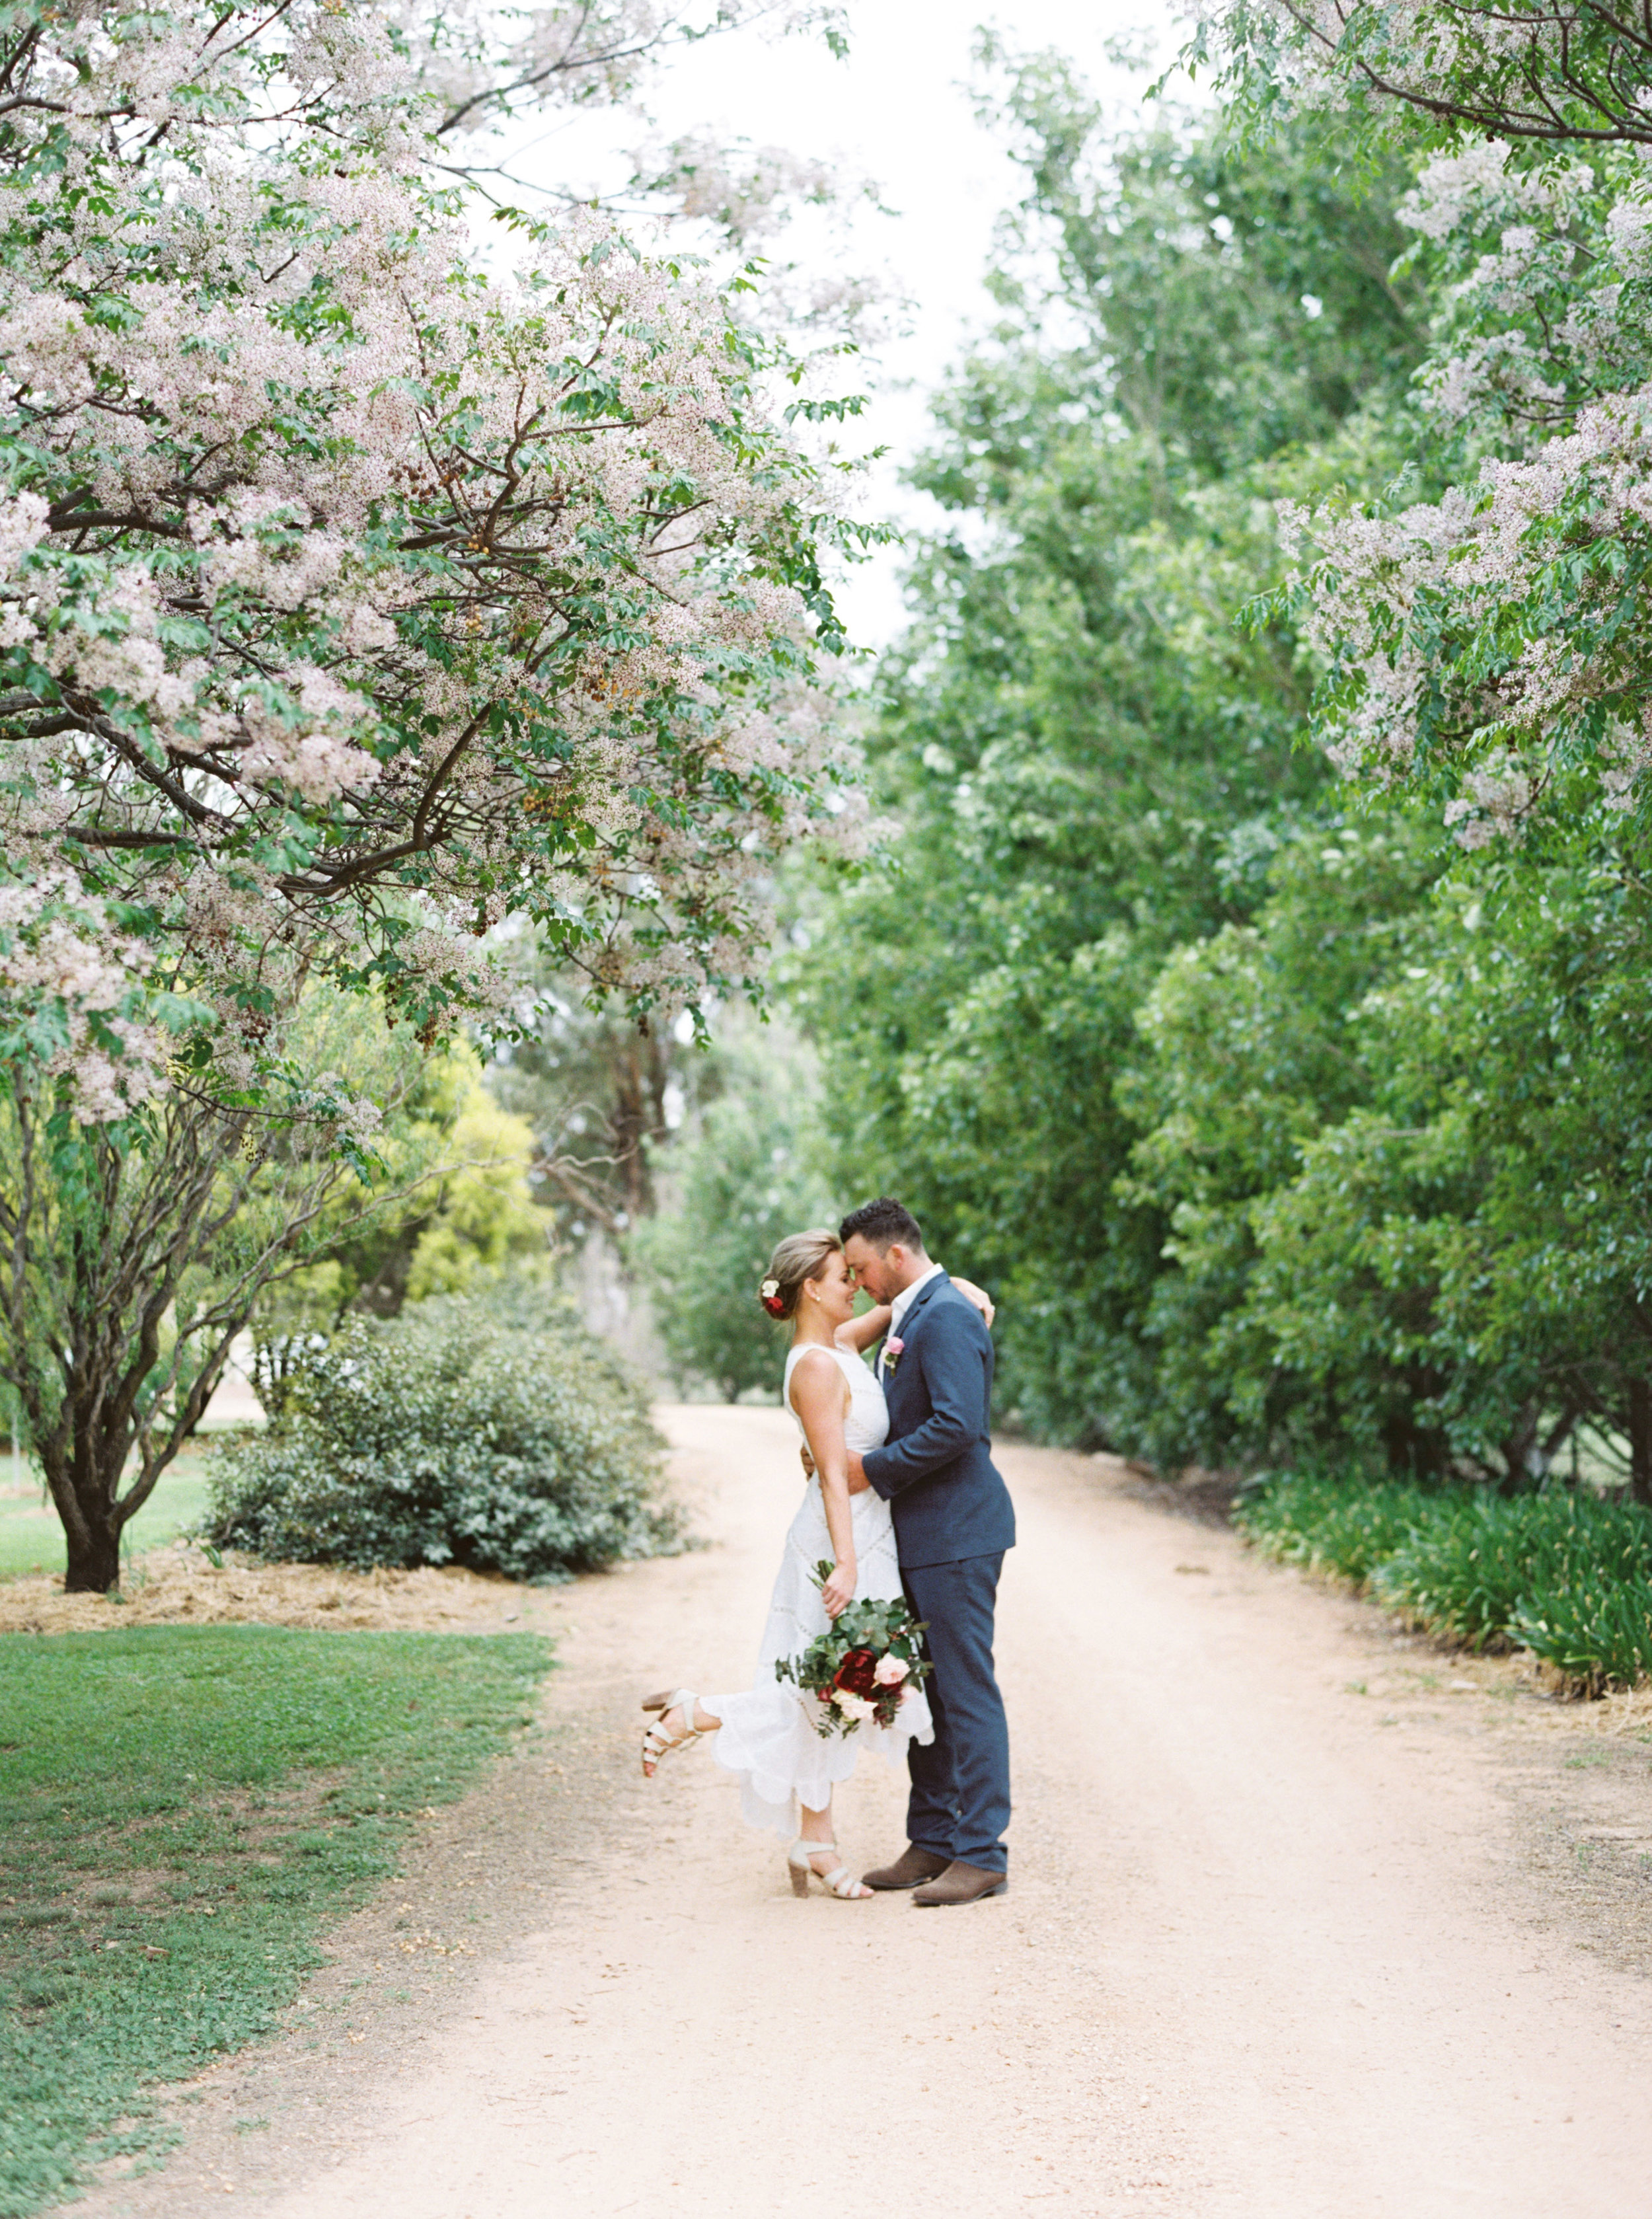 00039- Fine Art Film NSW Wedding Photographer Australia Sheri McMahon.jpg